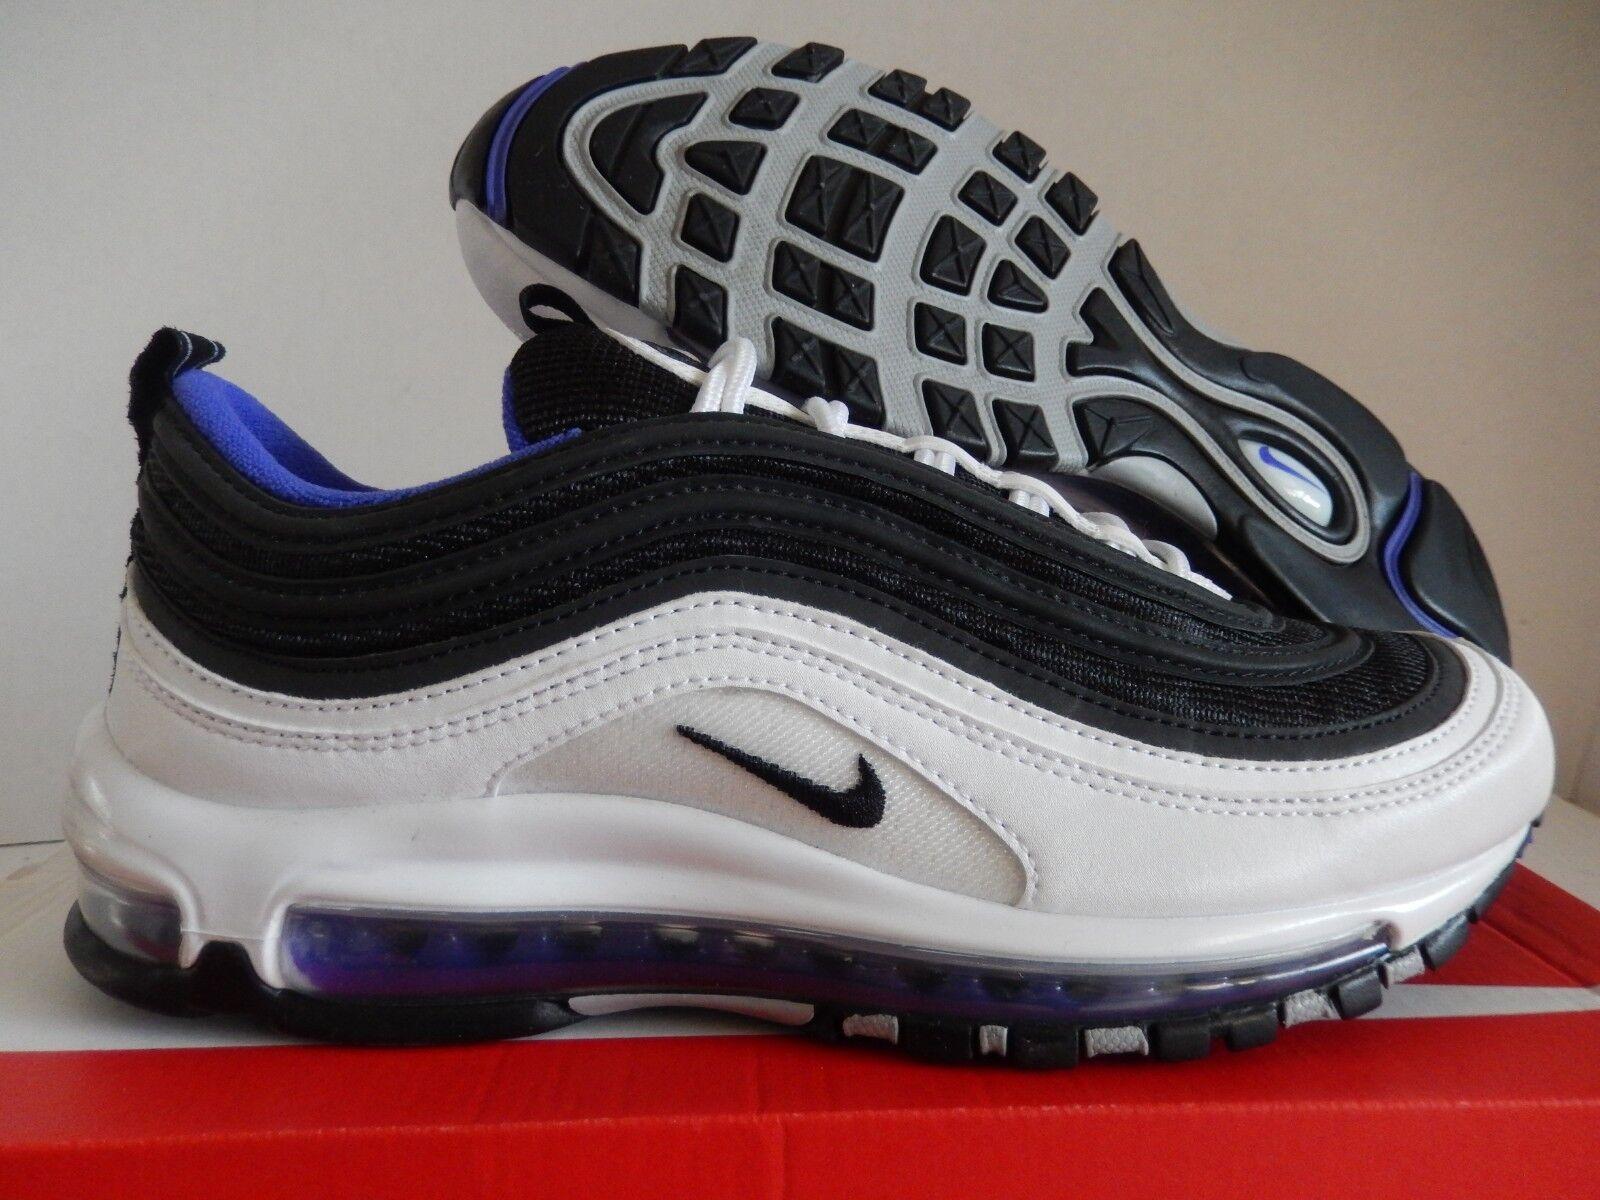 New Nike Air Max 97 Terry Cloth Size 11 Black White